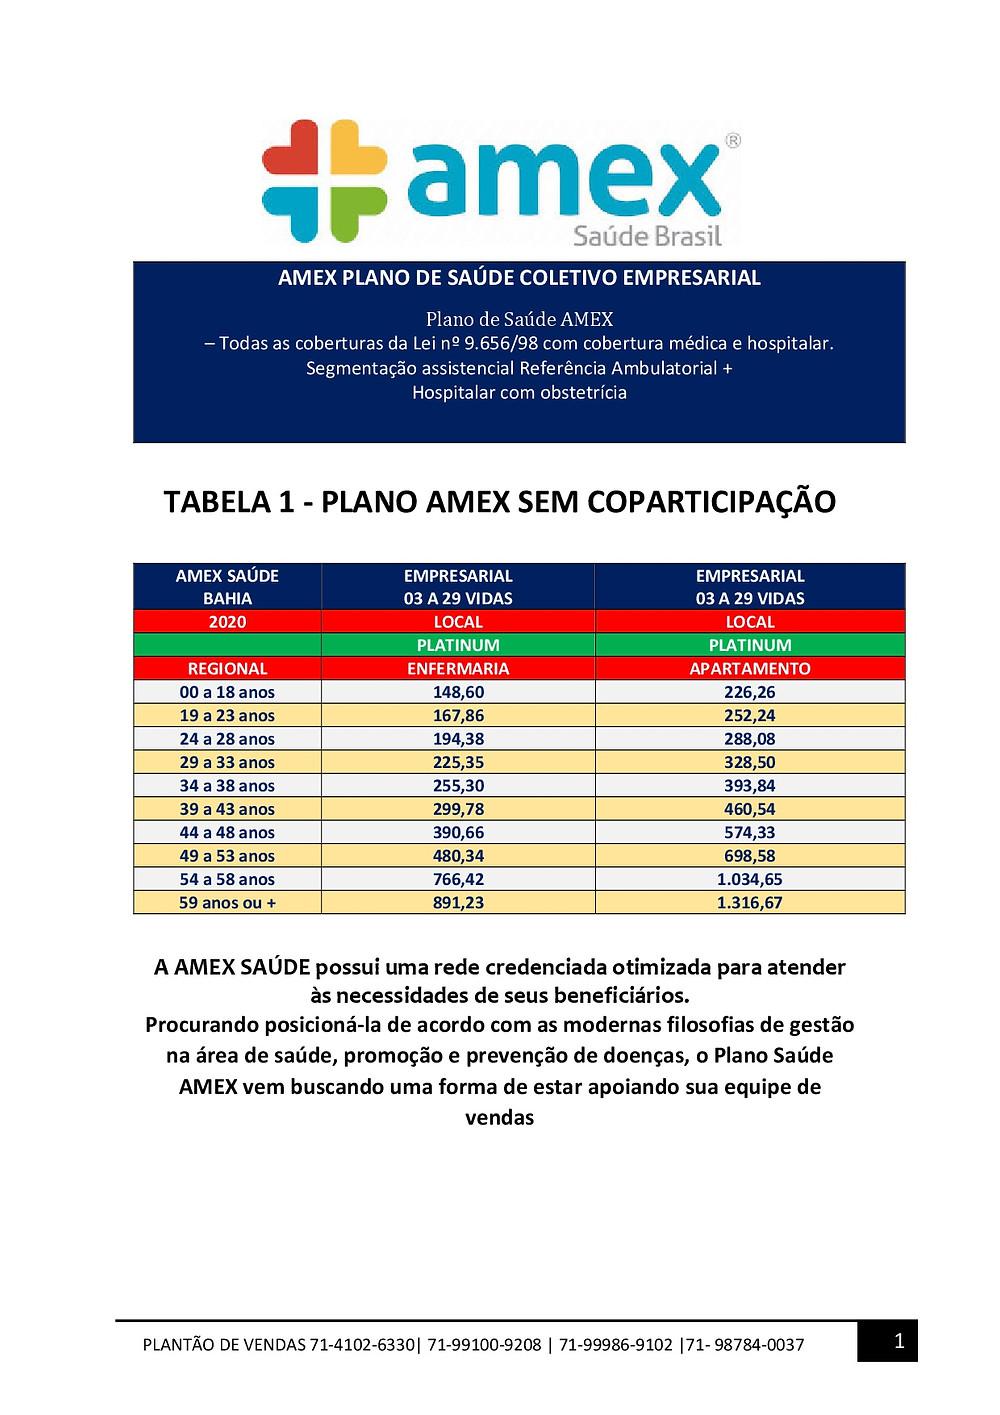 Tabelas de precos dos valores médios dos planos de saude na Bahia (Empresarial)